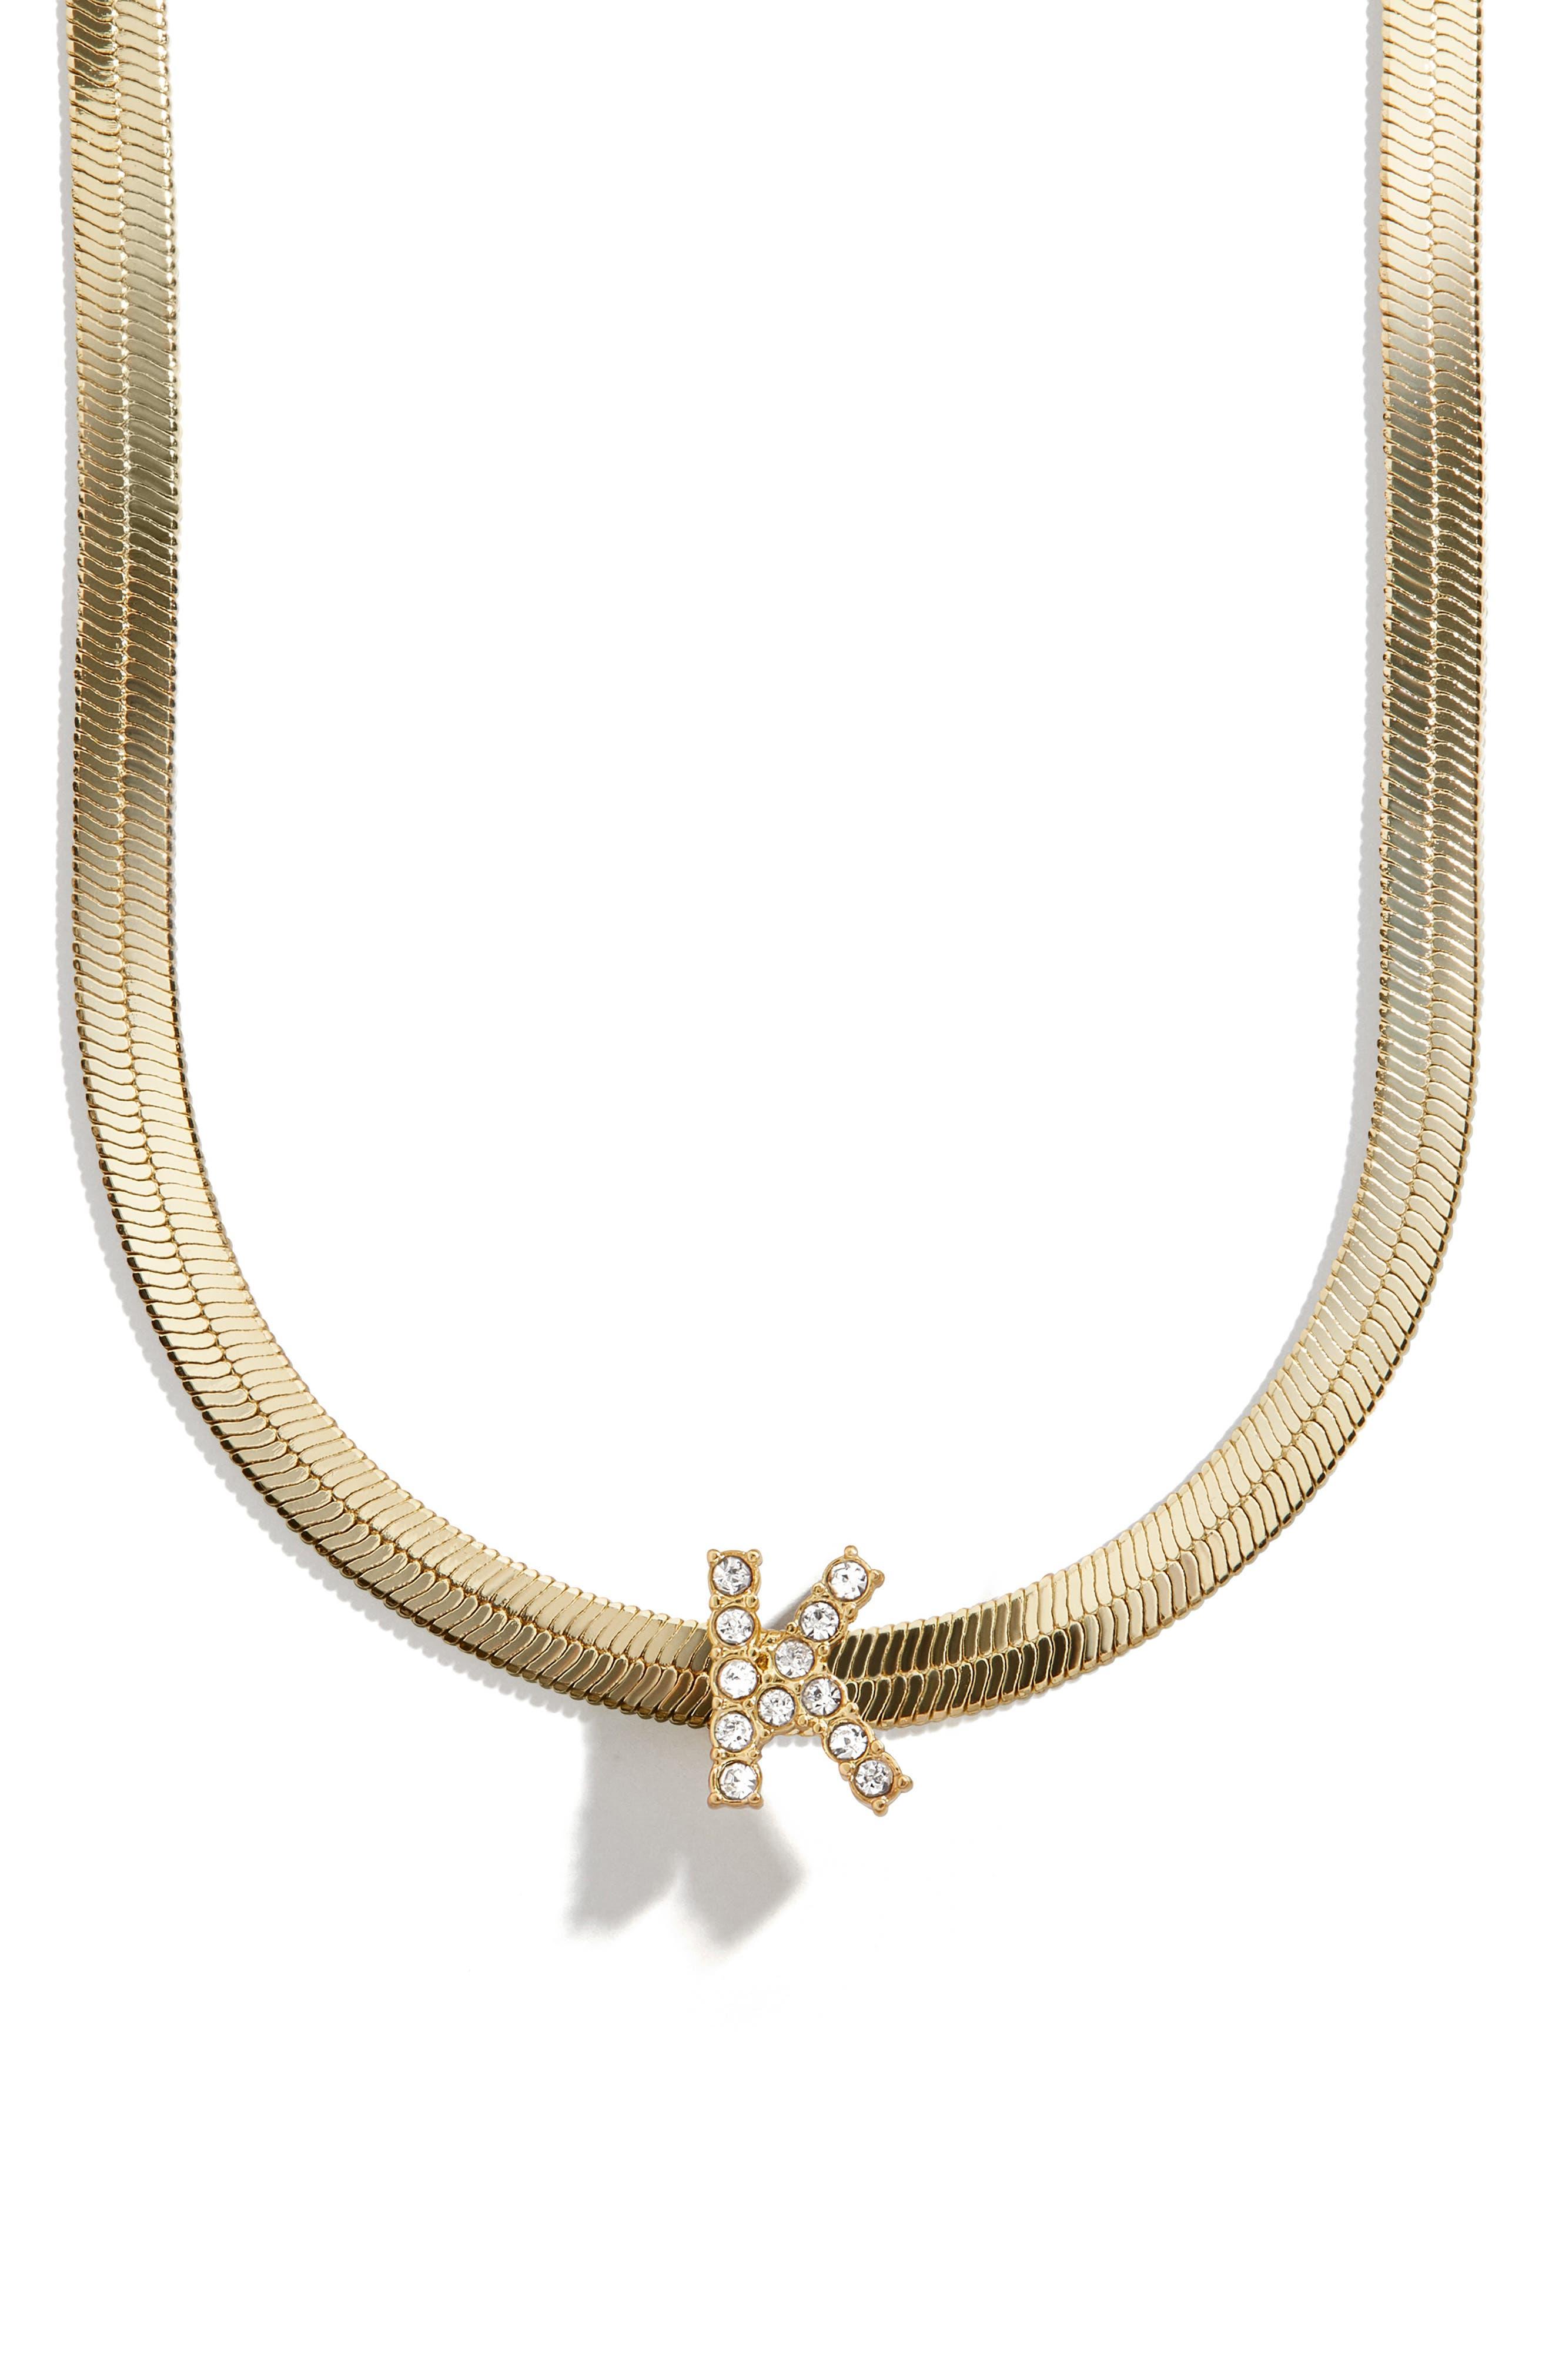 Baublebar Necklaces GINA NECKLACE